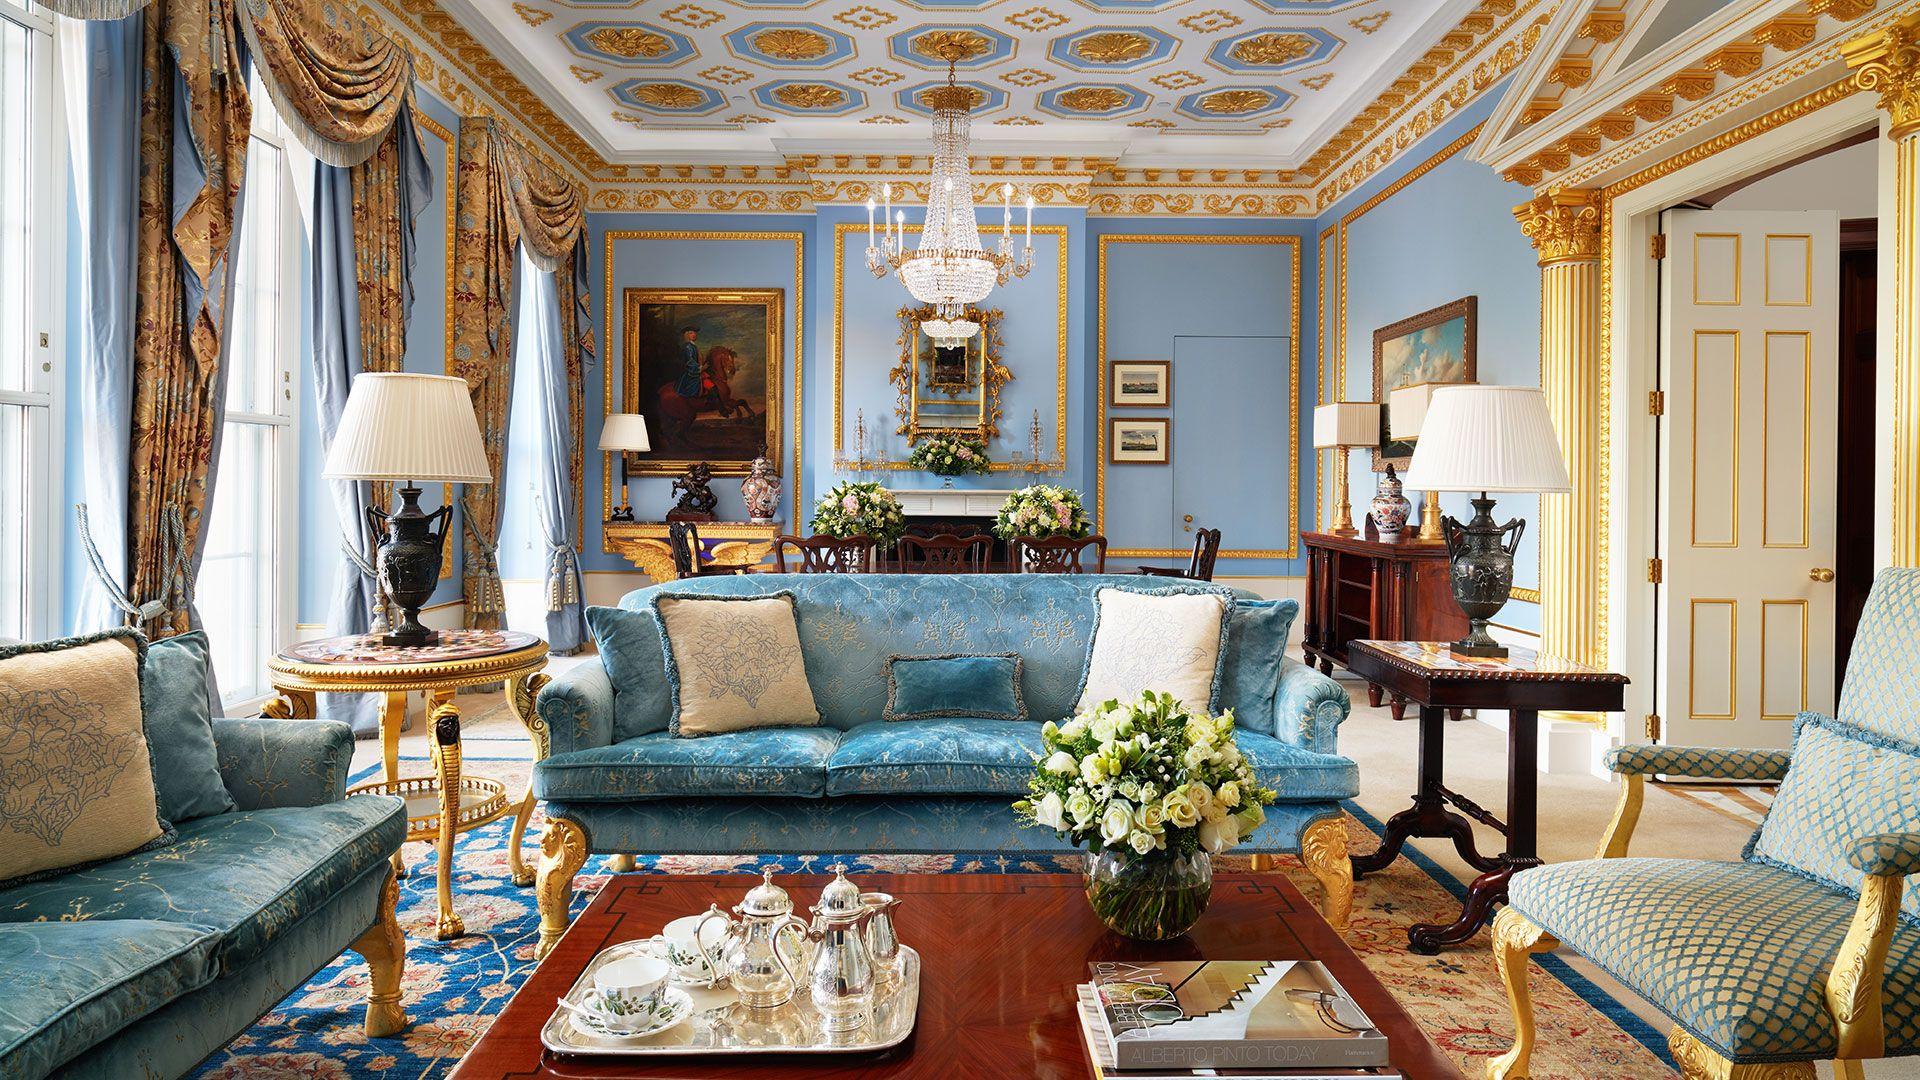 The Royal Suite The Lanesborough 5 Star Hotel London London